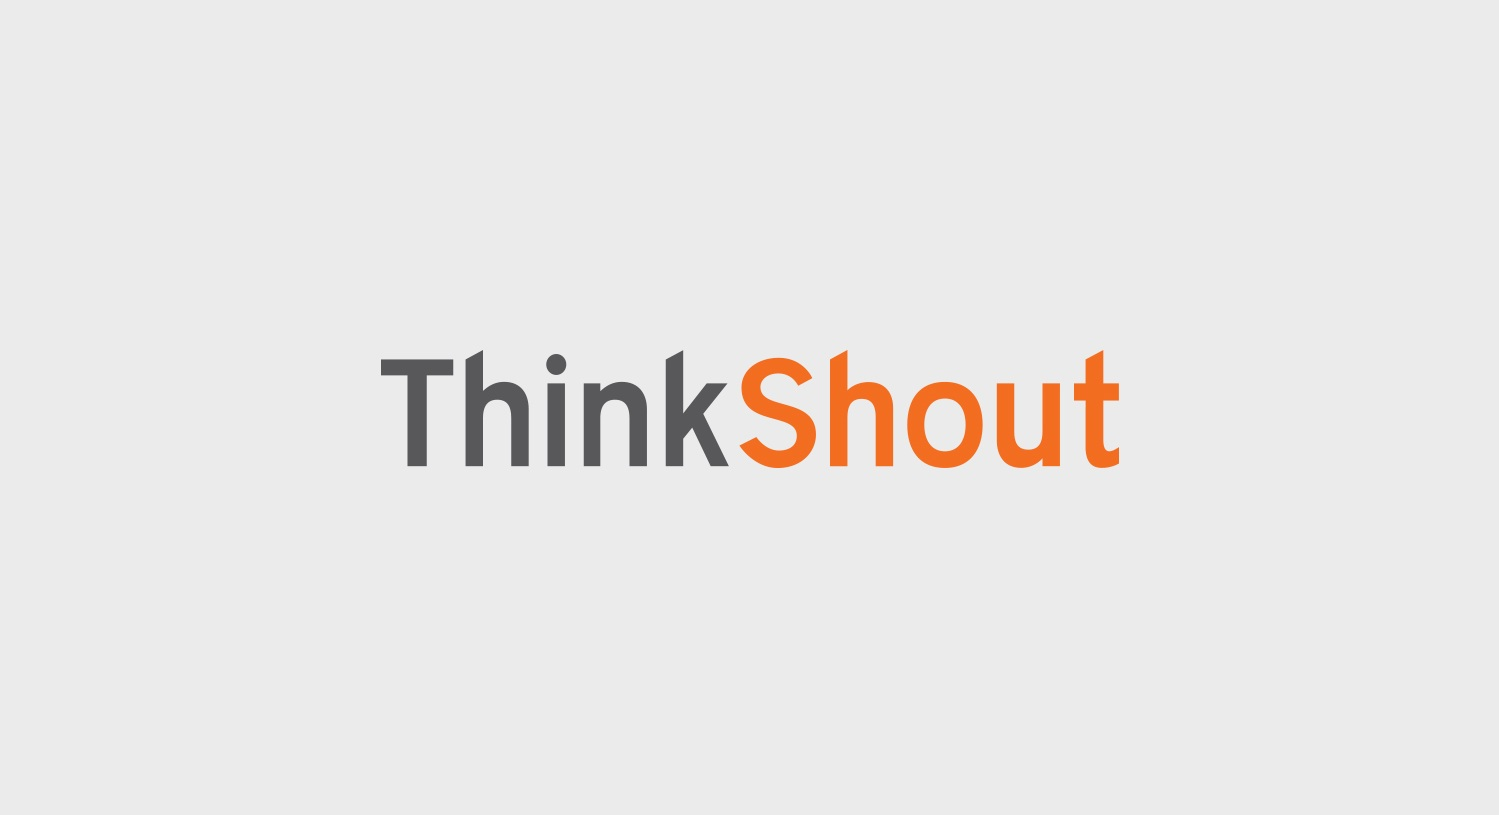 thinkshout.jpg